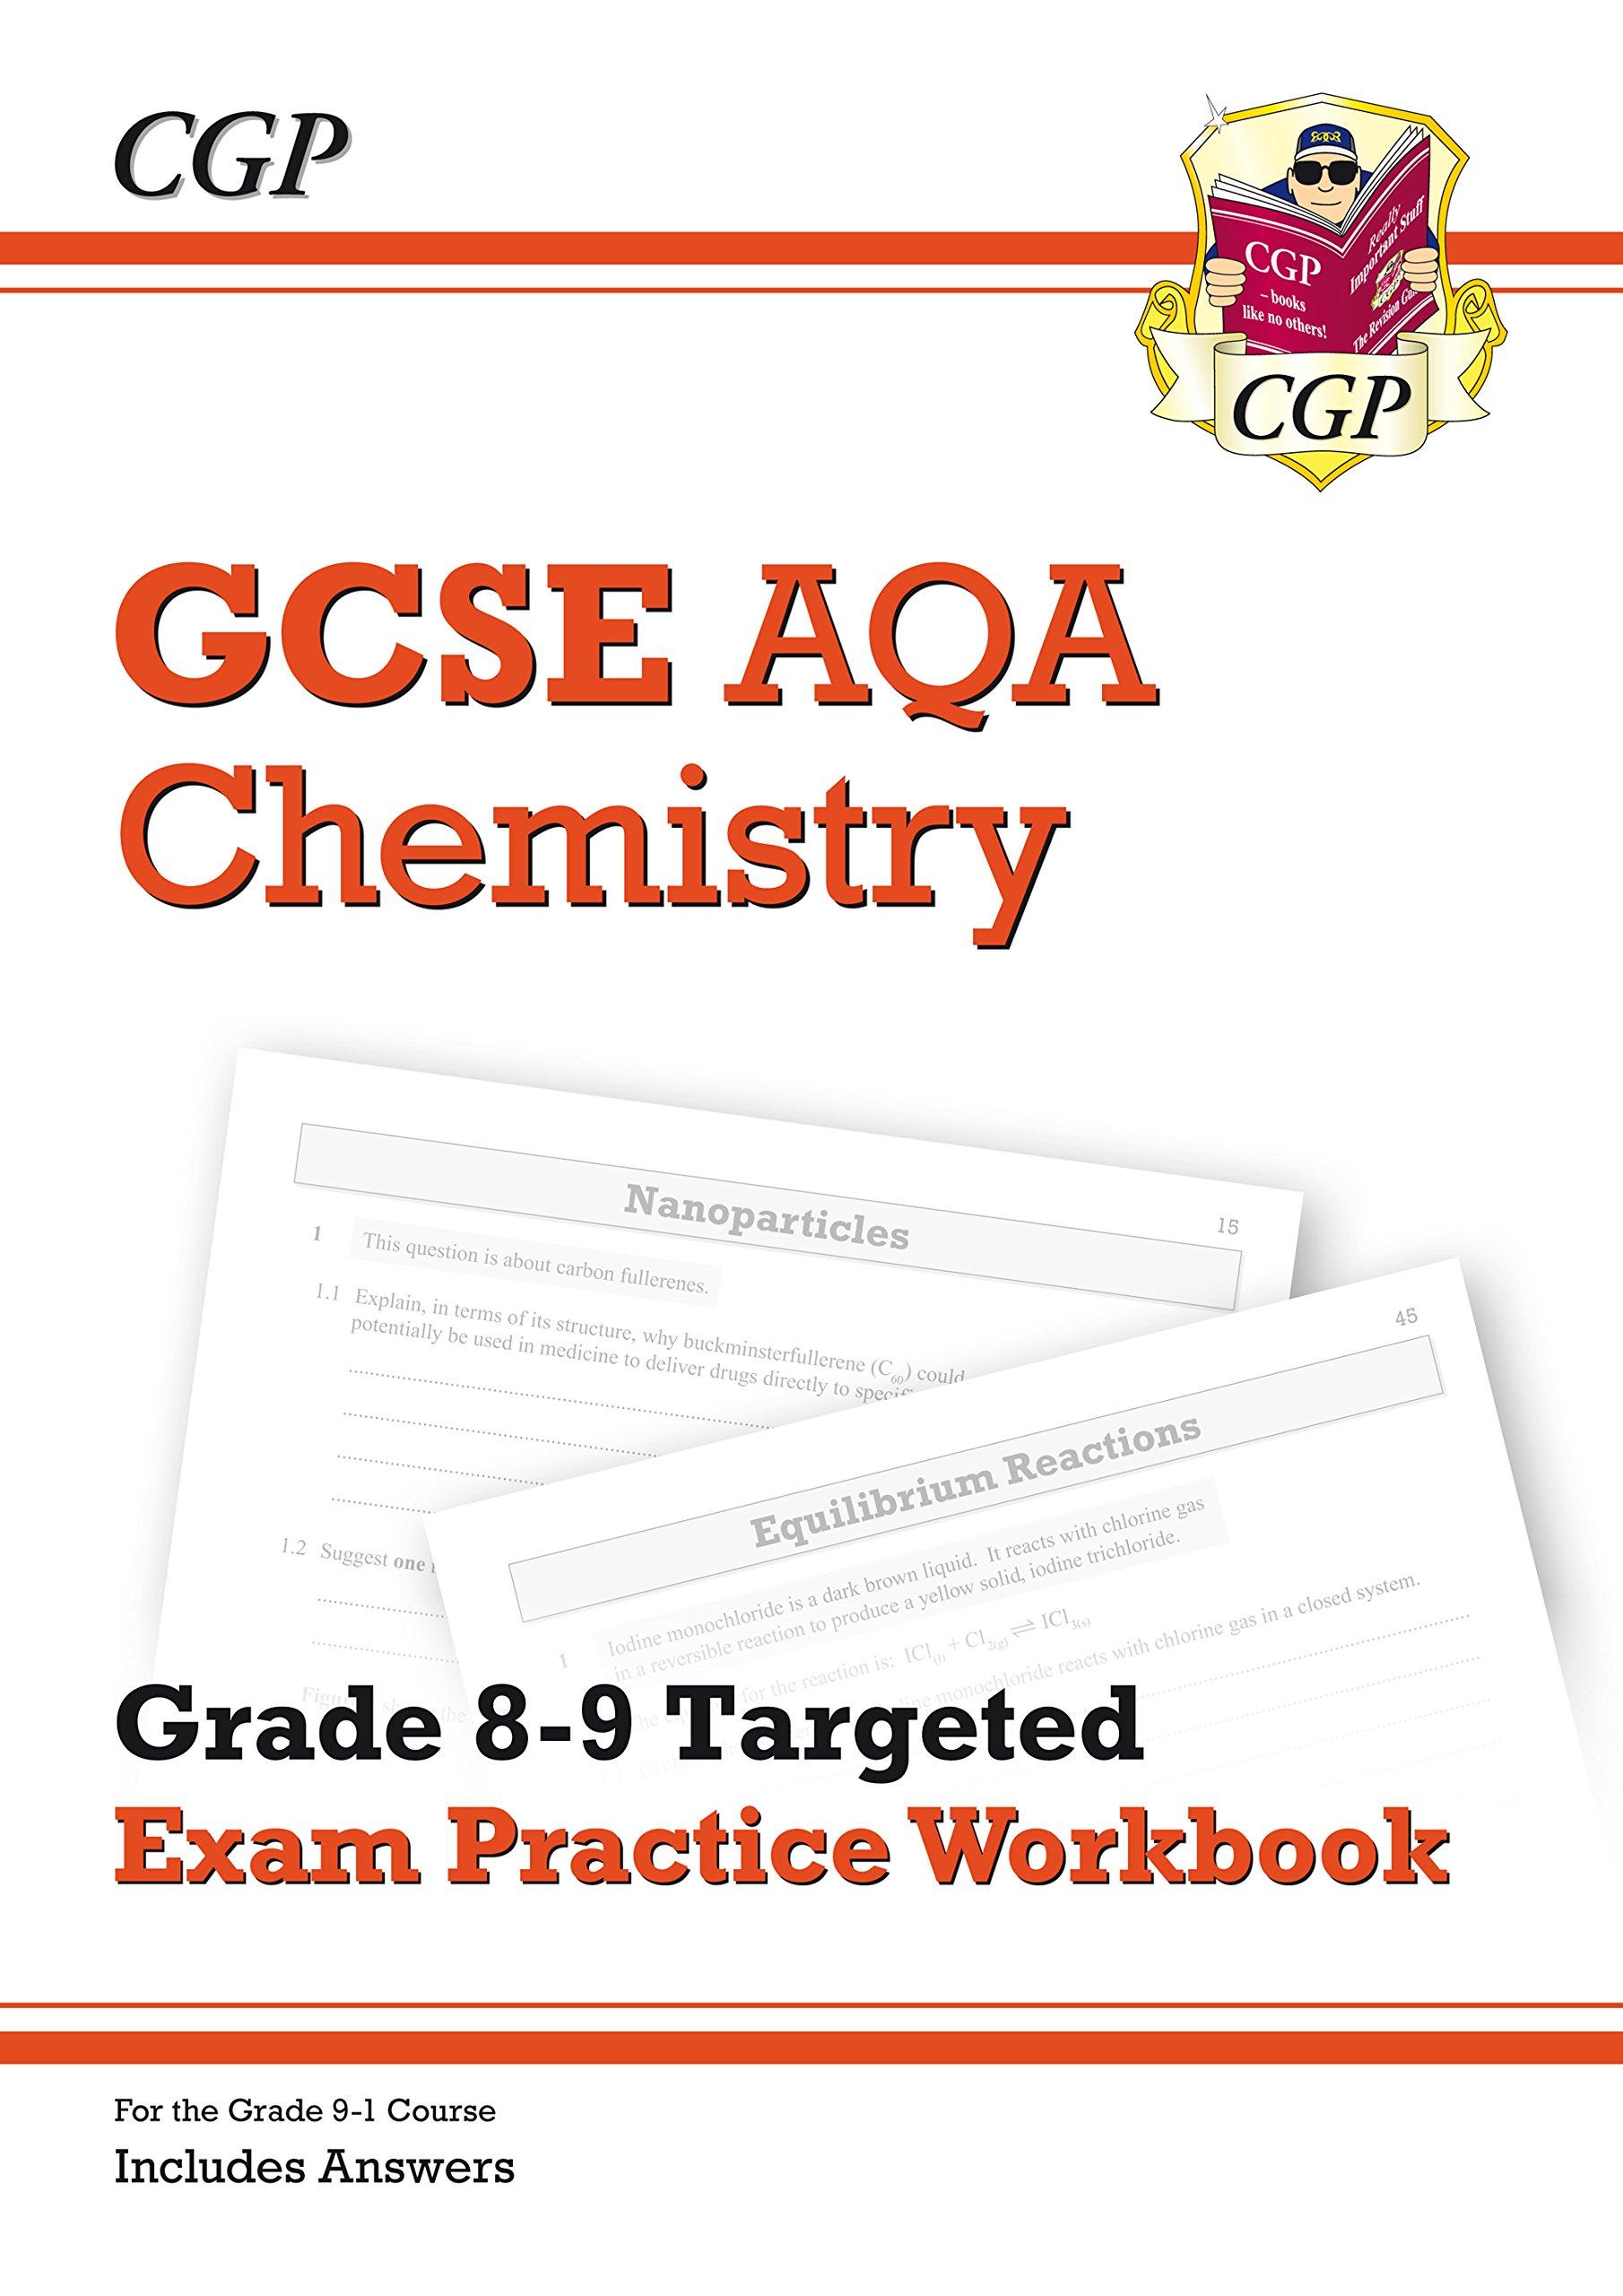 New GCSE Chemistry AQA Grade 8-9 Targeted Exam Practice